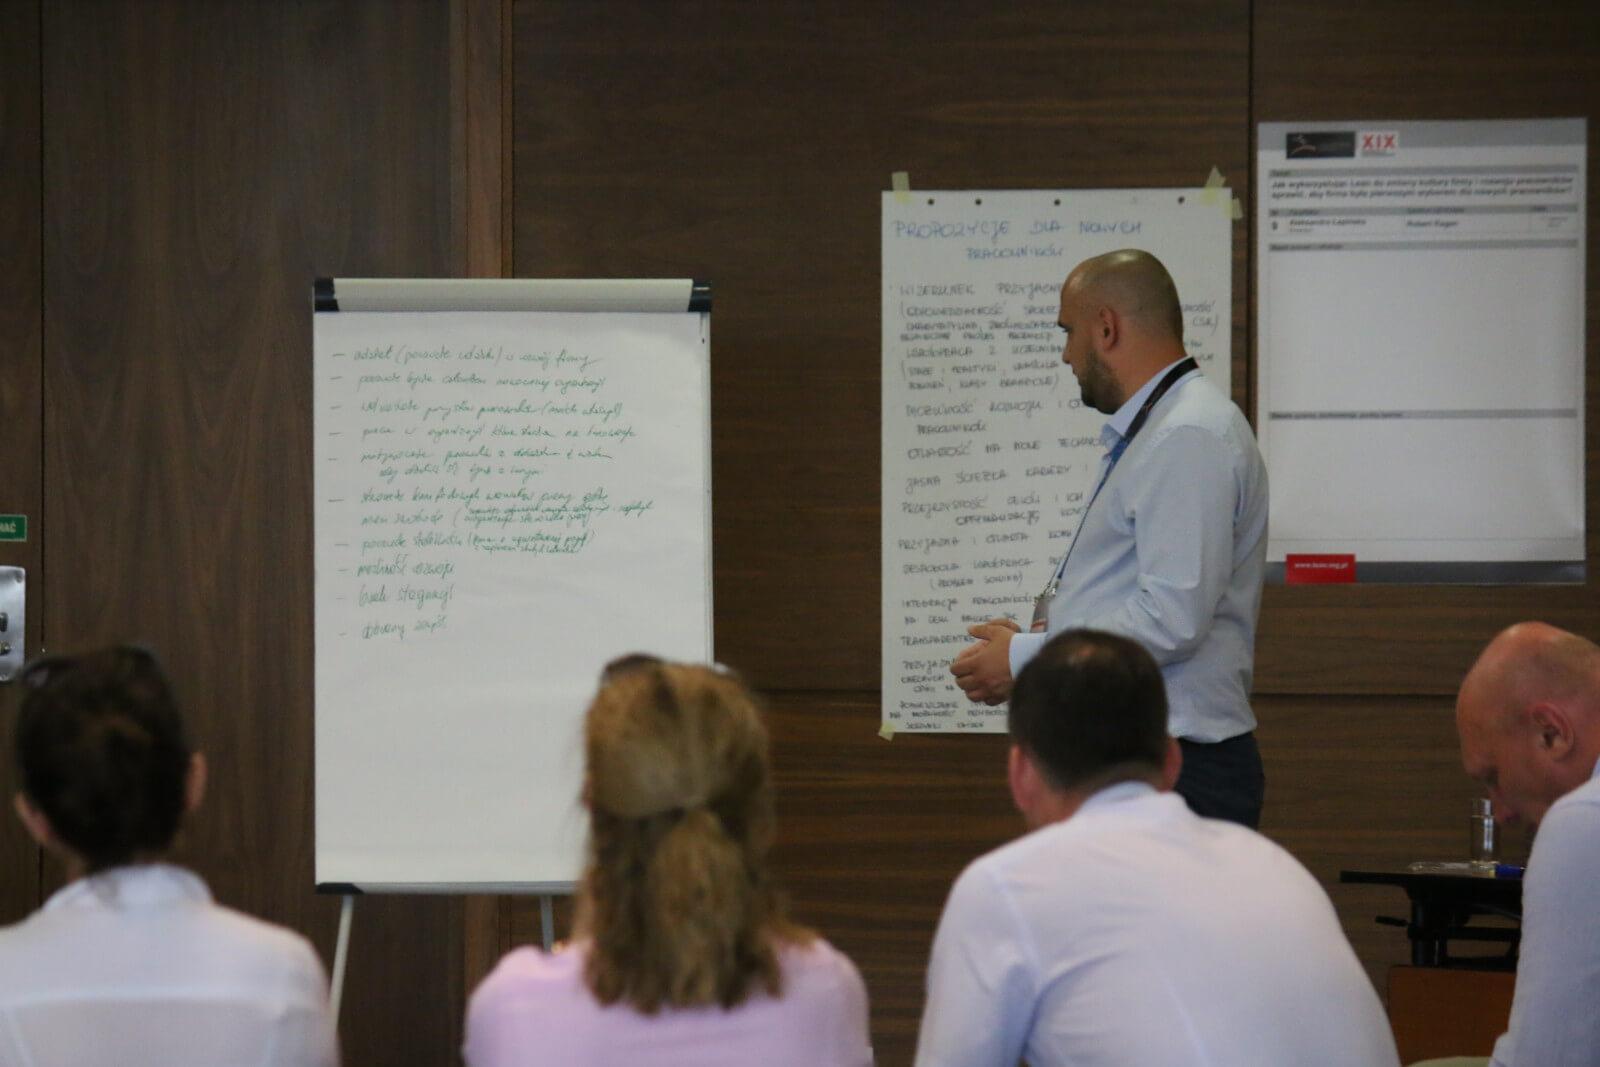 Niezaangażowany menedżer - jeden ztematów na Lean Management